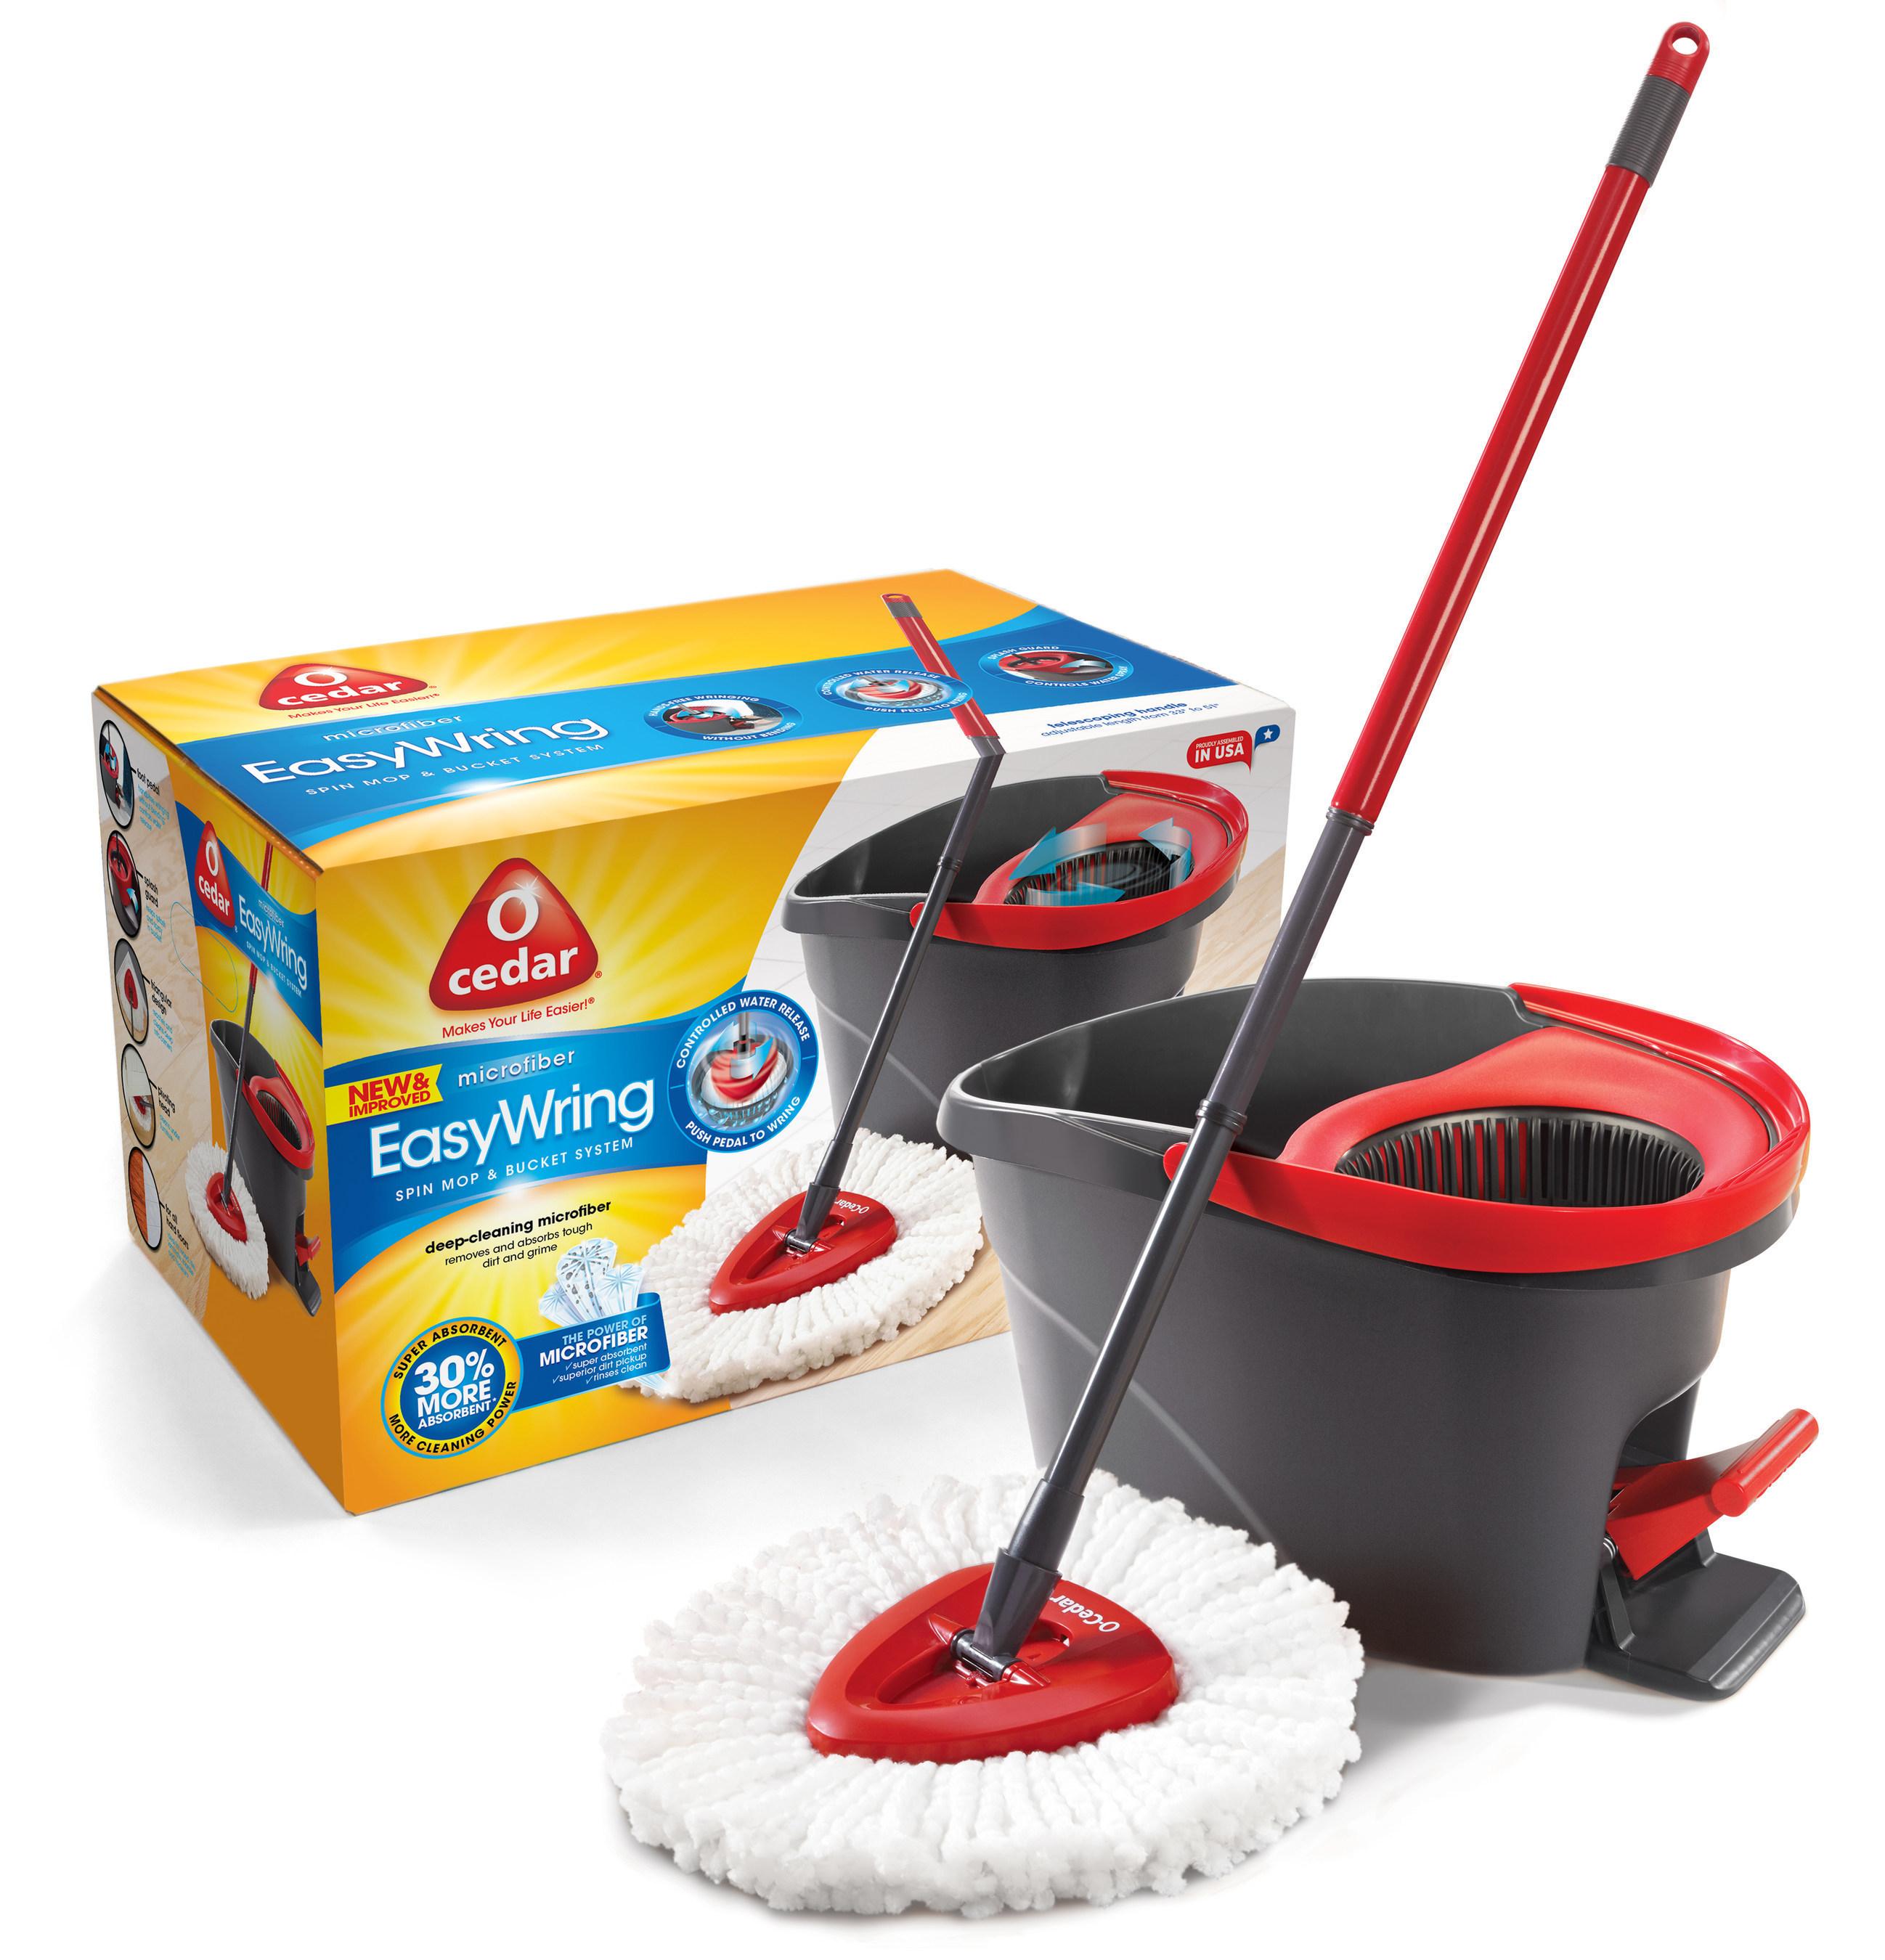 O-Cedar's EasyWring(TM) Spin Mop & Bucket System